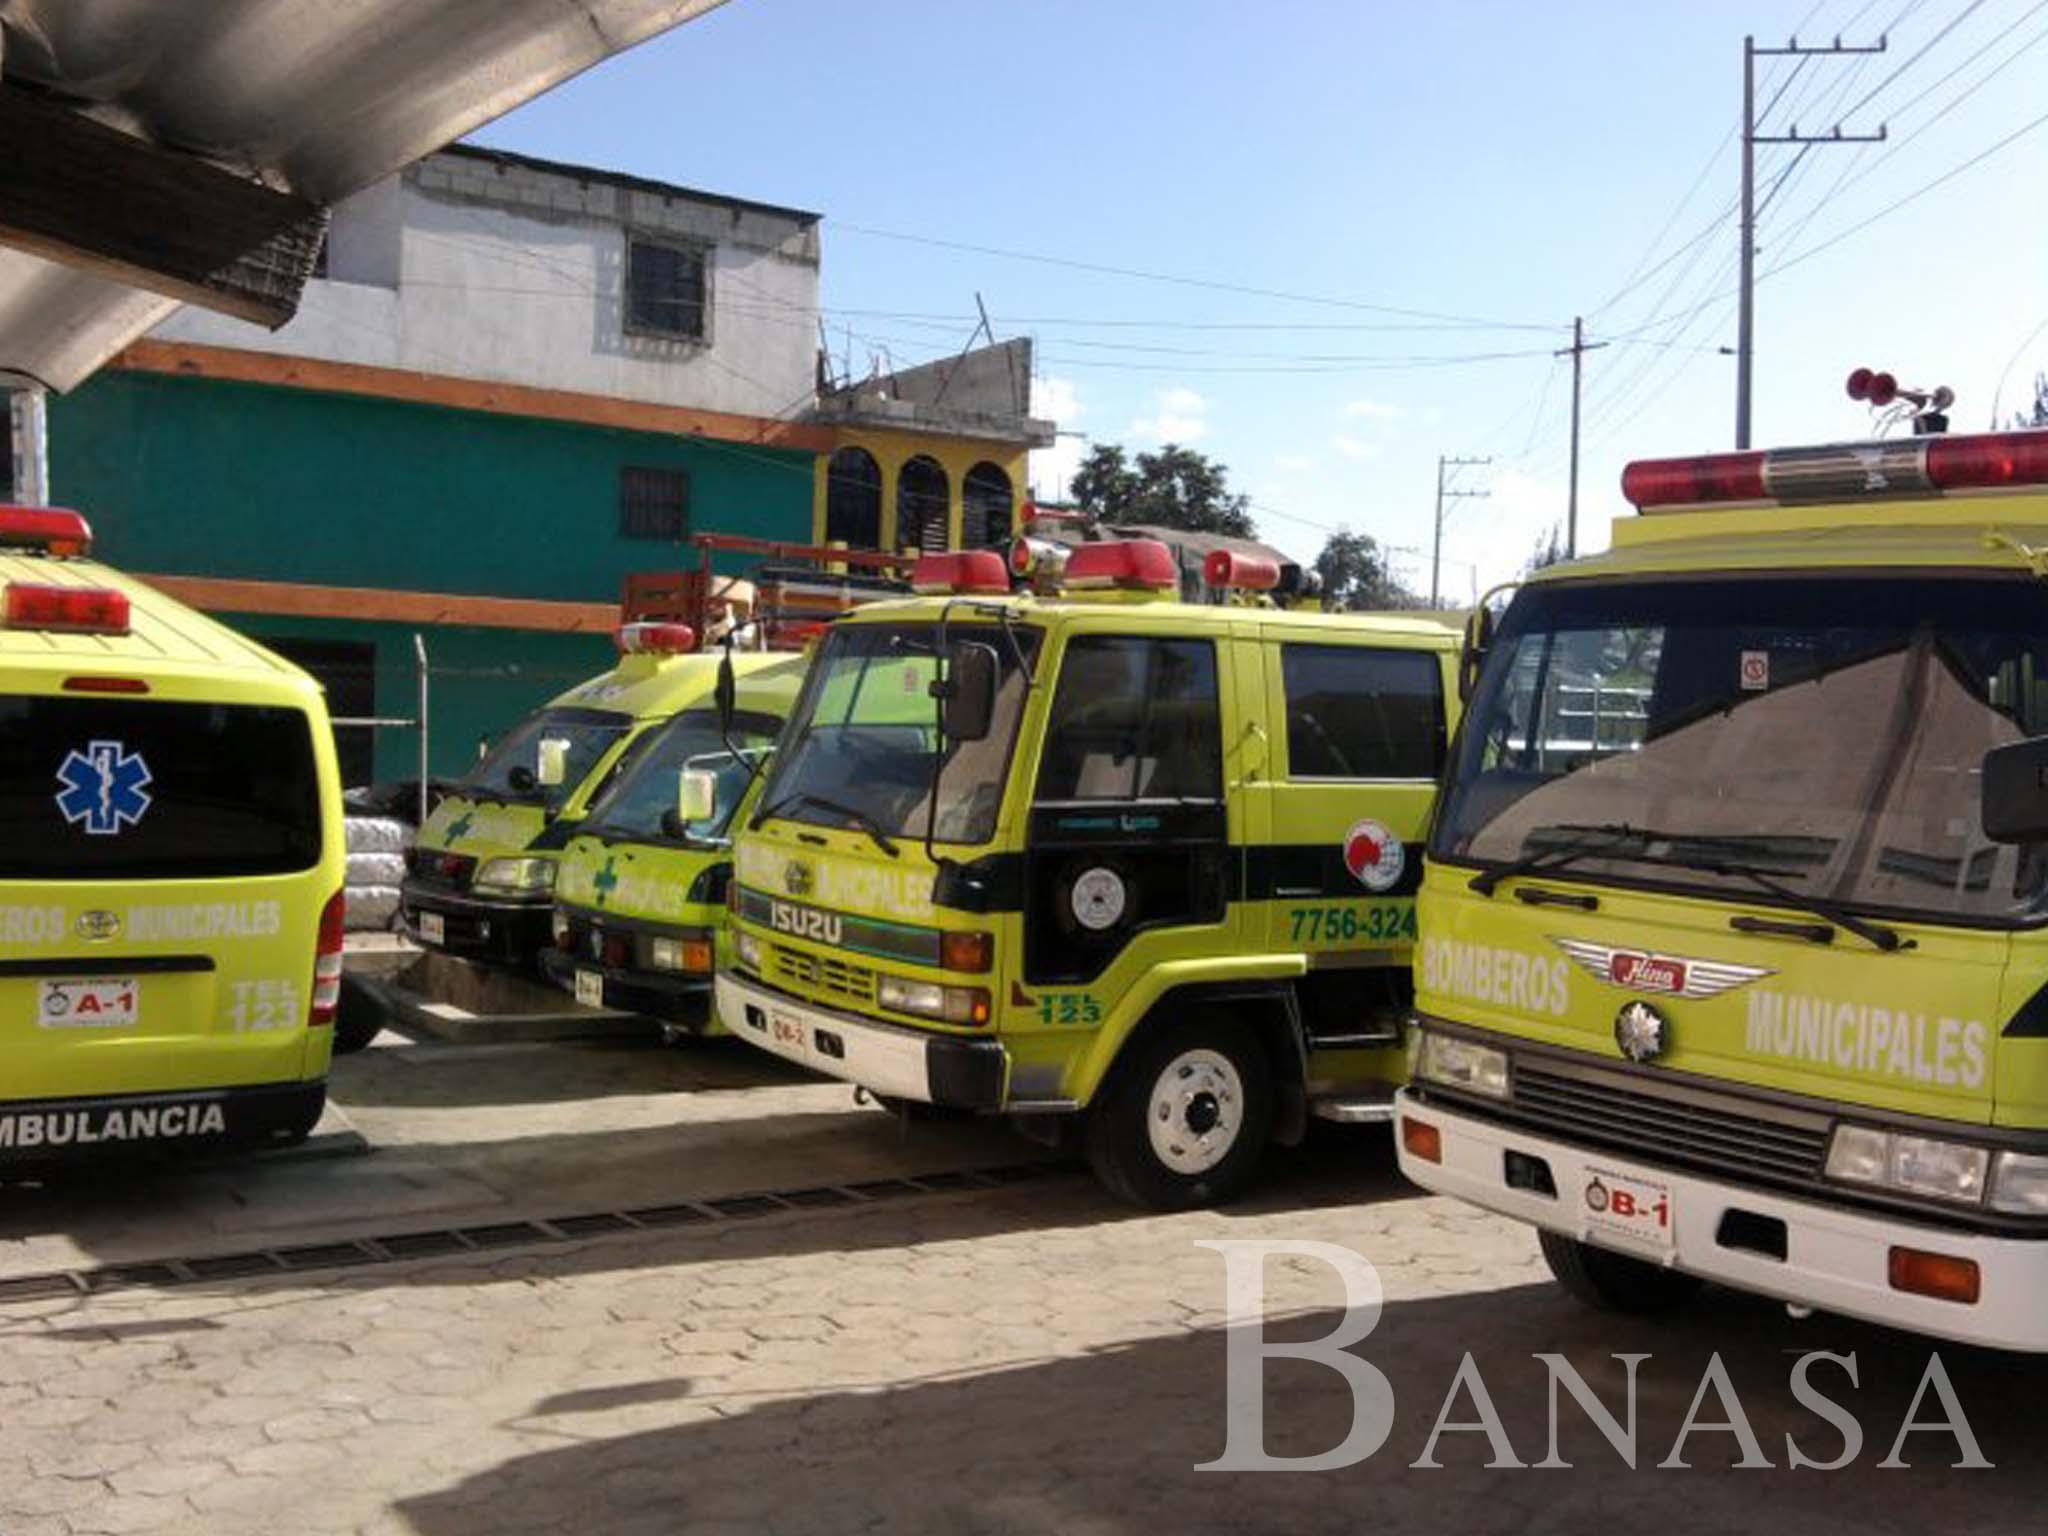 Banasa ayudará dona combustible durante 12 meses, a los bomberos municipales de Coatepeque